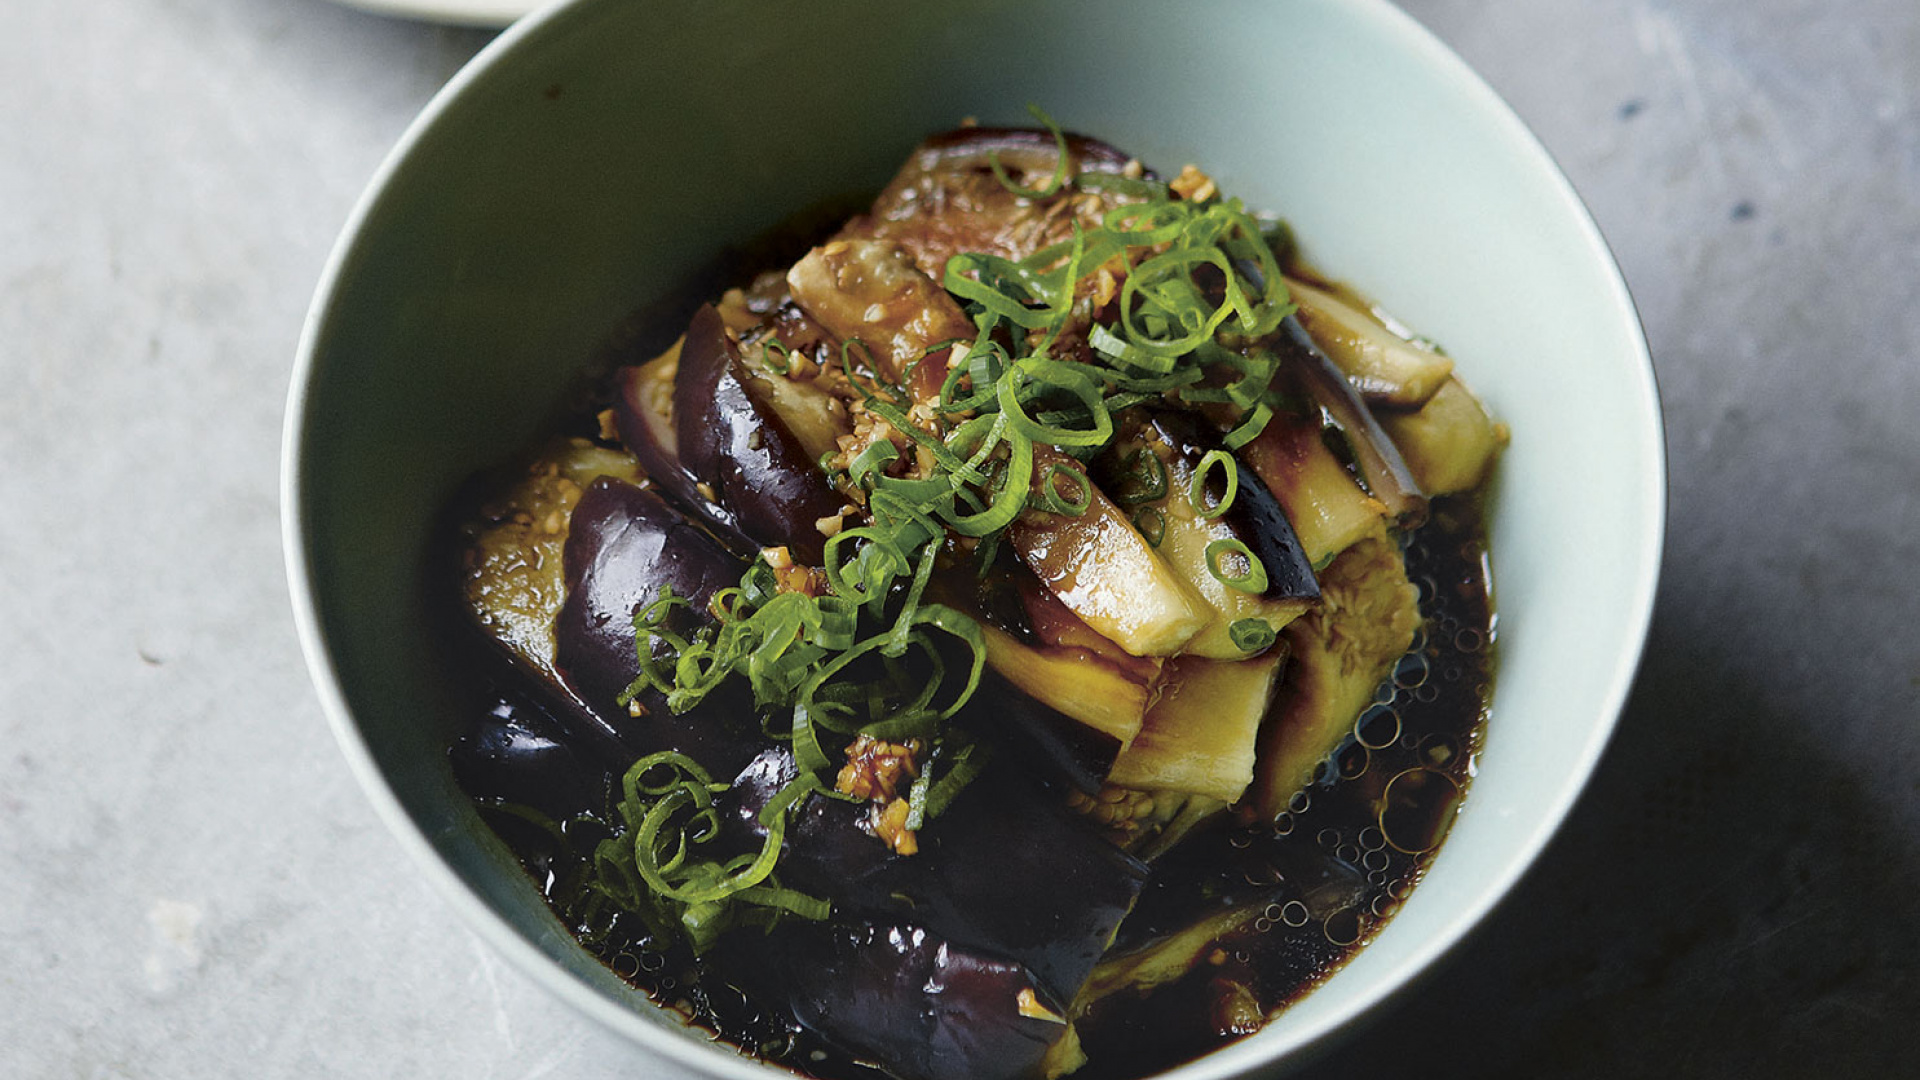 Cool-steamed aubergine. Photography by Yuki Sugiura